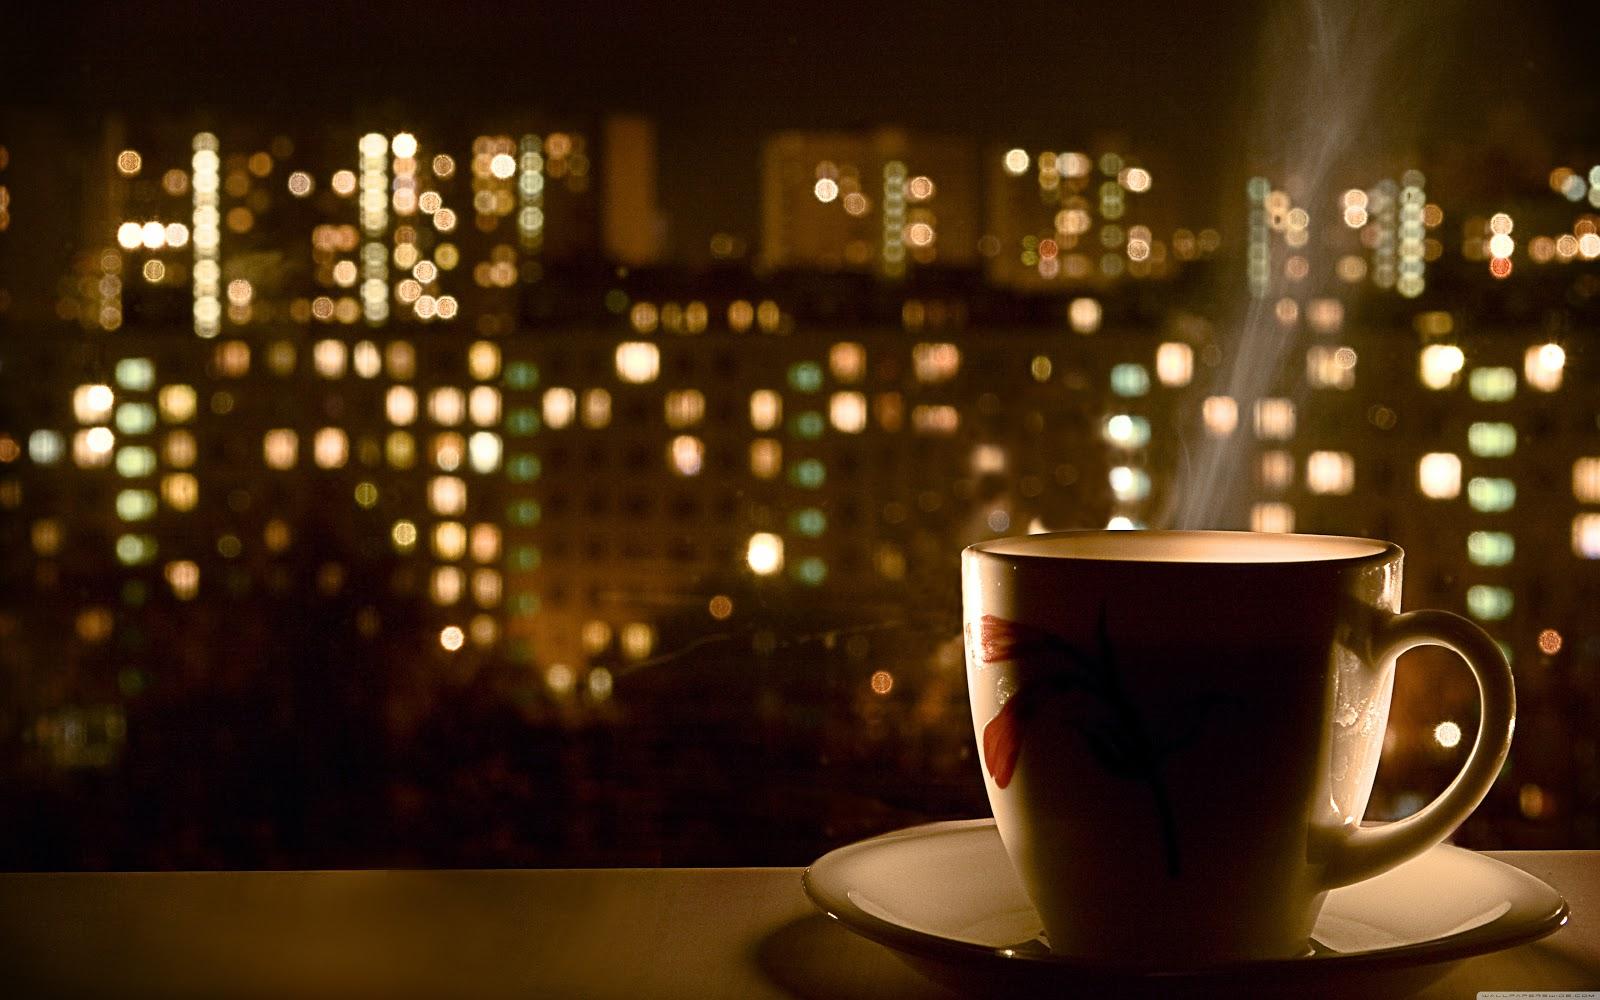 http://4.bp.blogspot.com/-CmvFDQRrP8E/T2OkVh18QTI/AAAAAAAAAgo/WxqQZXhuzkI/s1600/cup_of_coffee-wallpaper-5120x3200.jpg